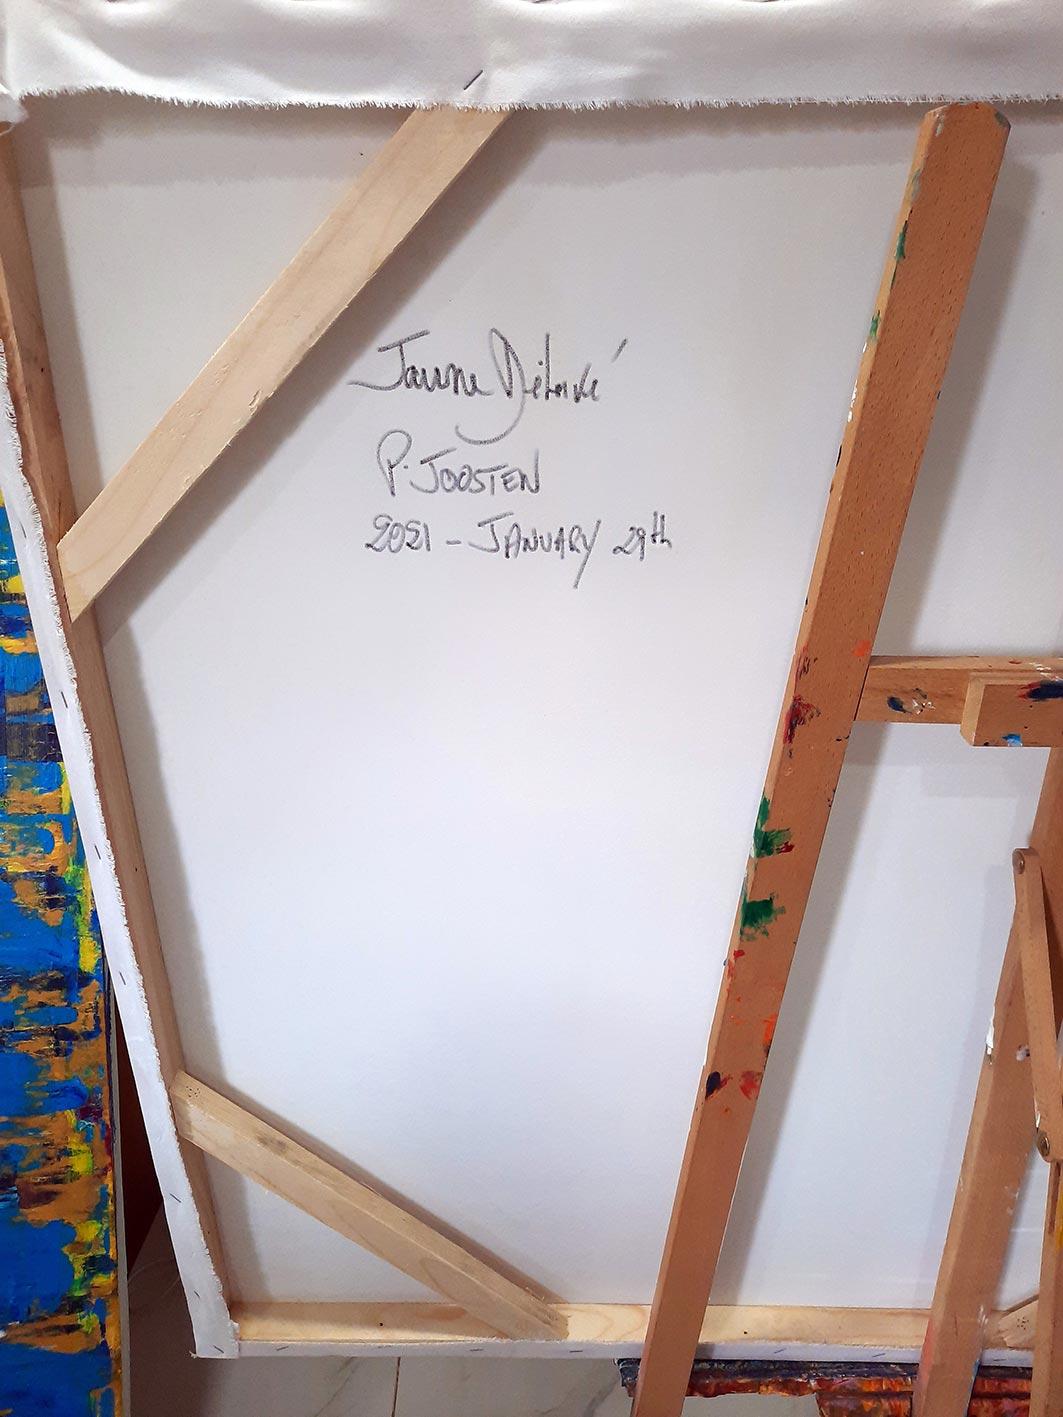 Jaune-Delave-Patrick-Joosten-2021-January-29th-Back-signature